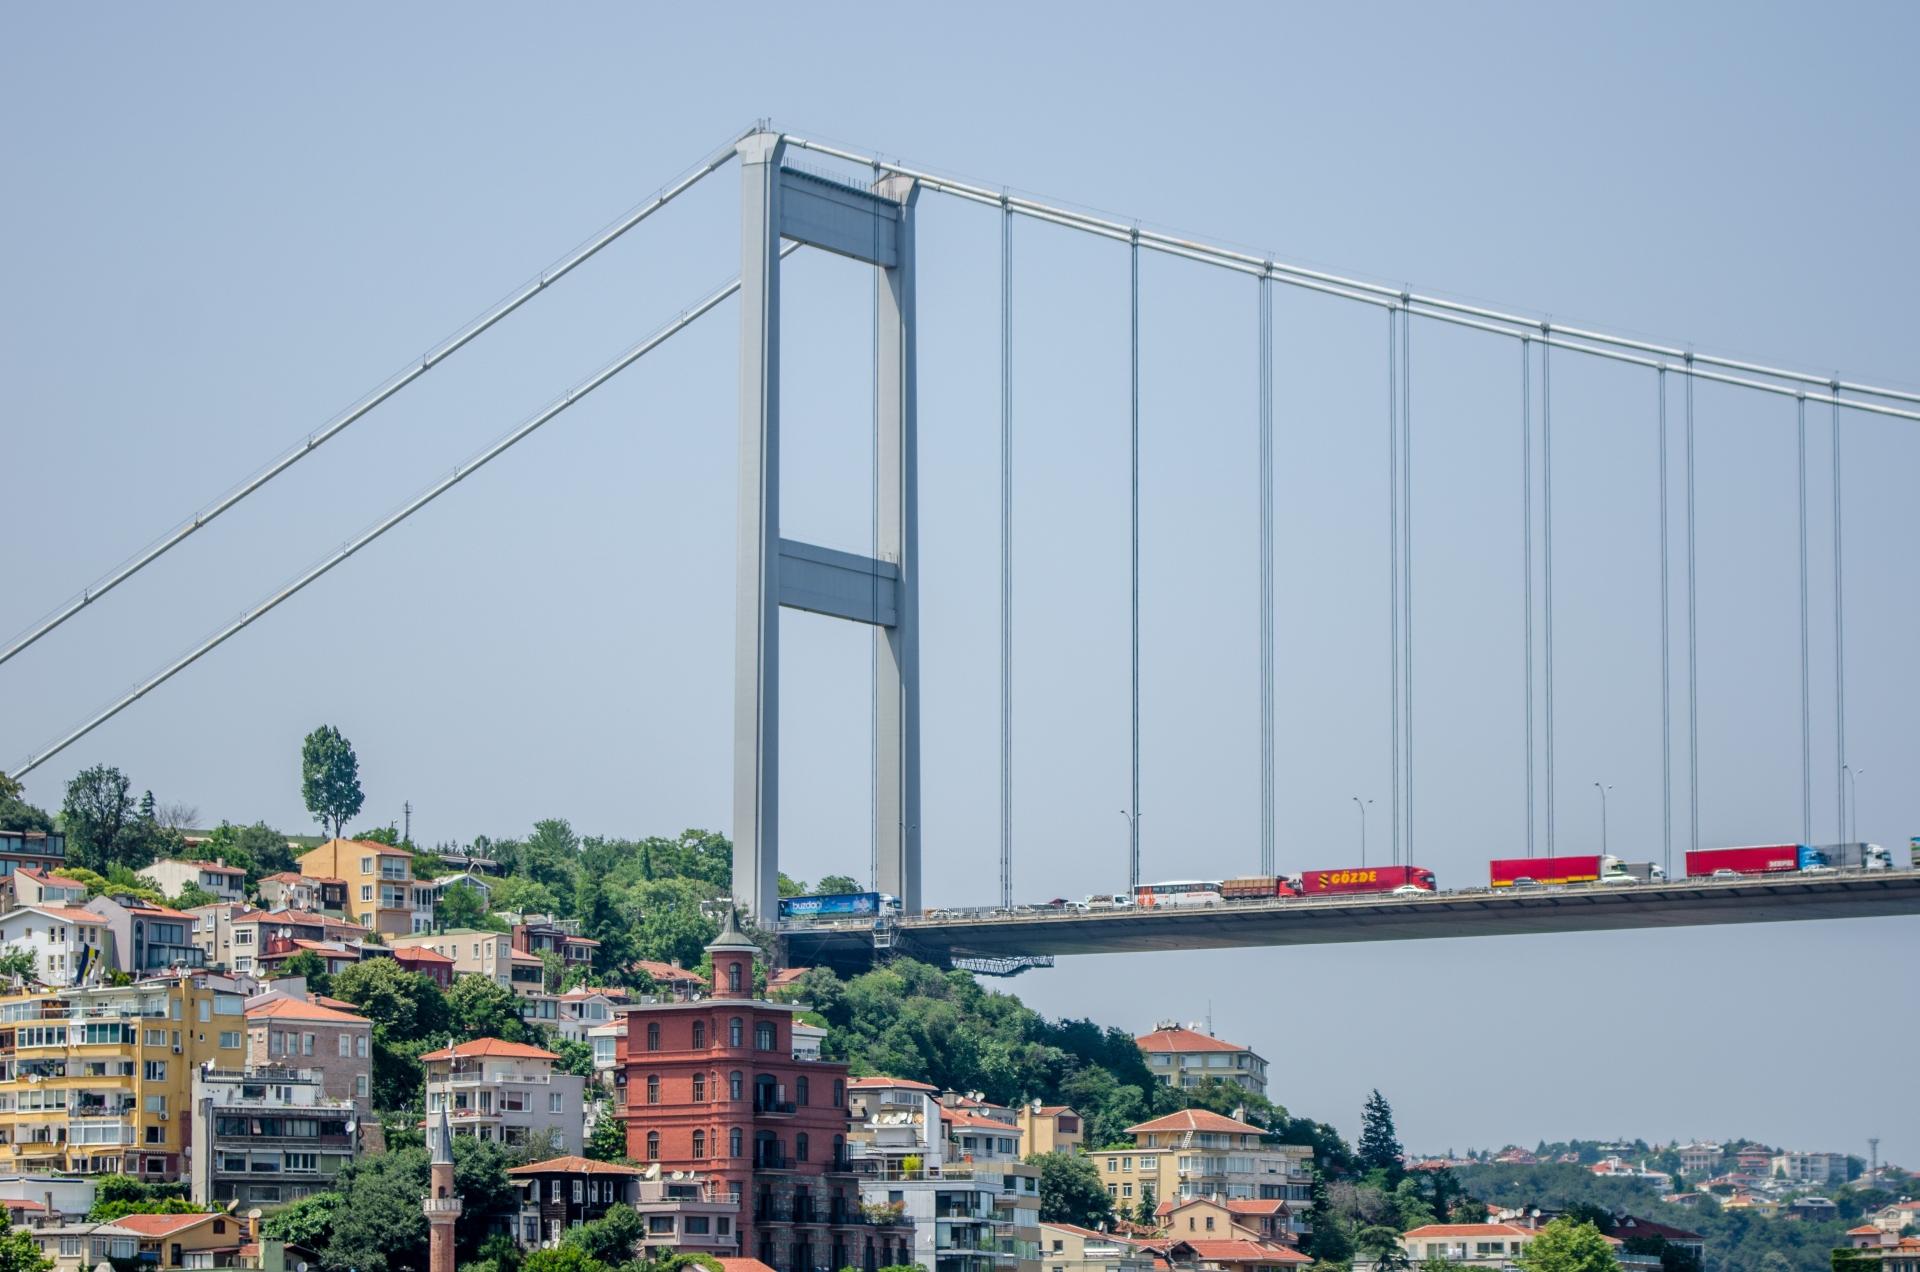 md-Bosporus140619052b